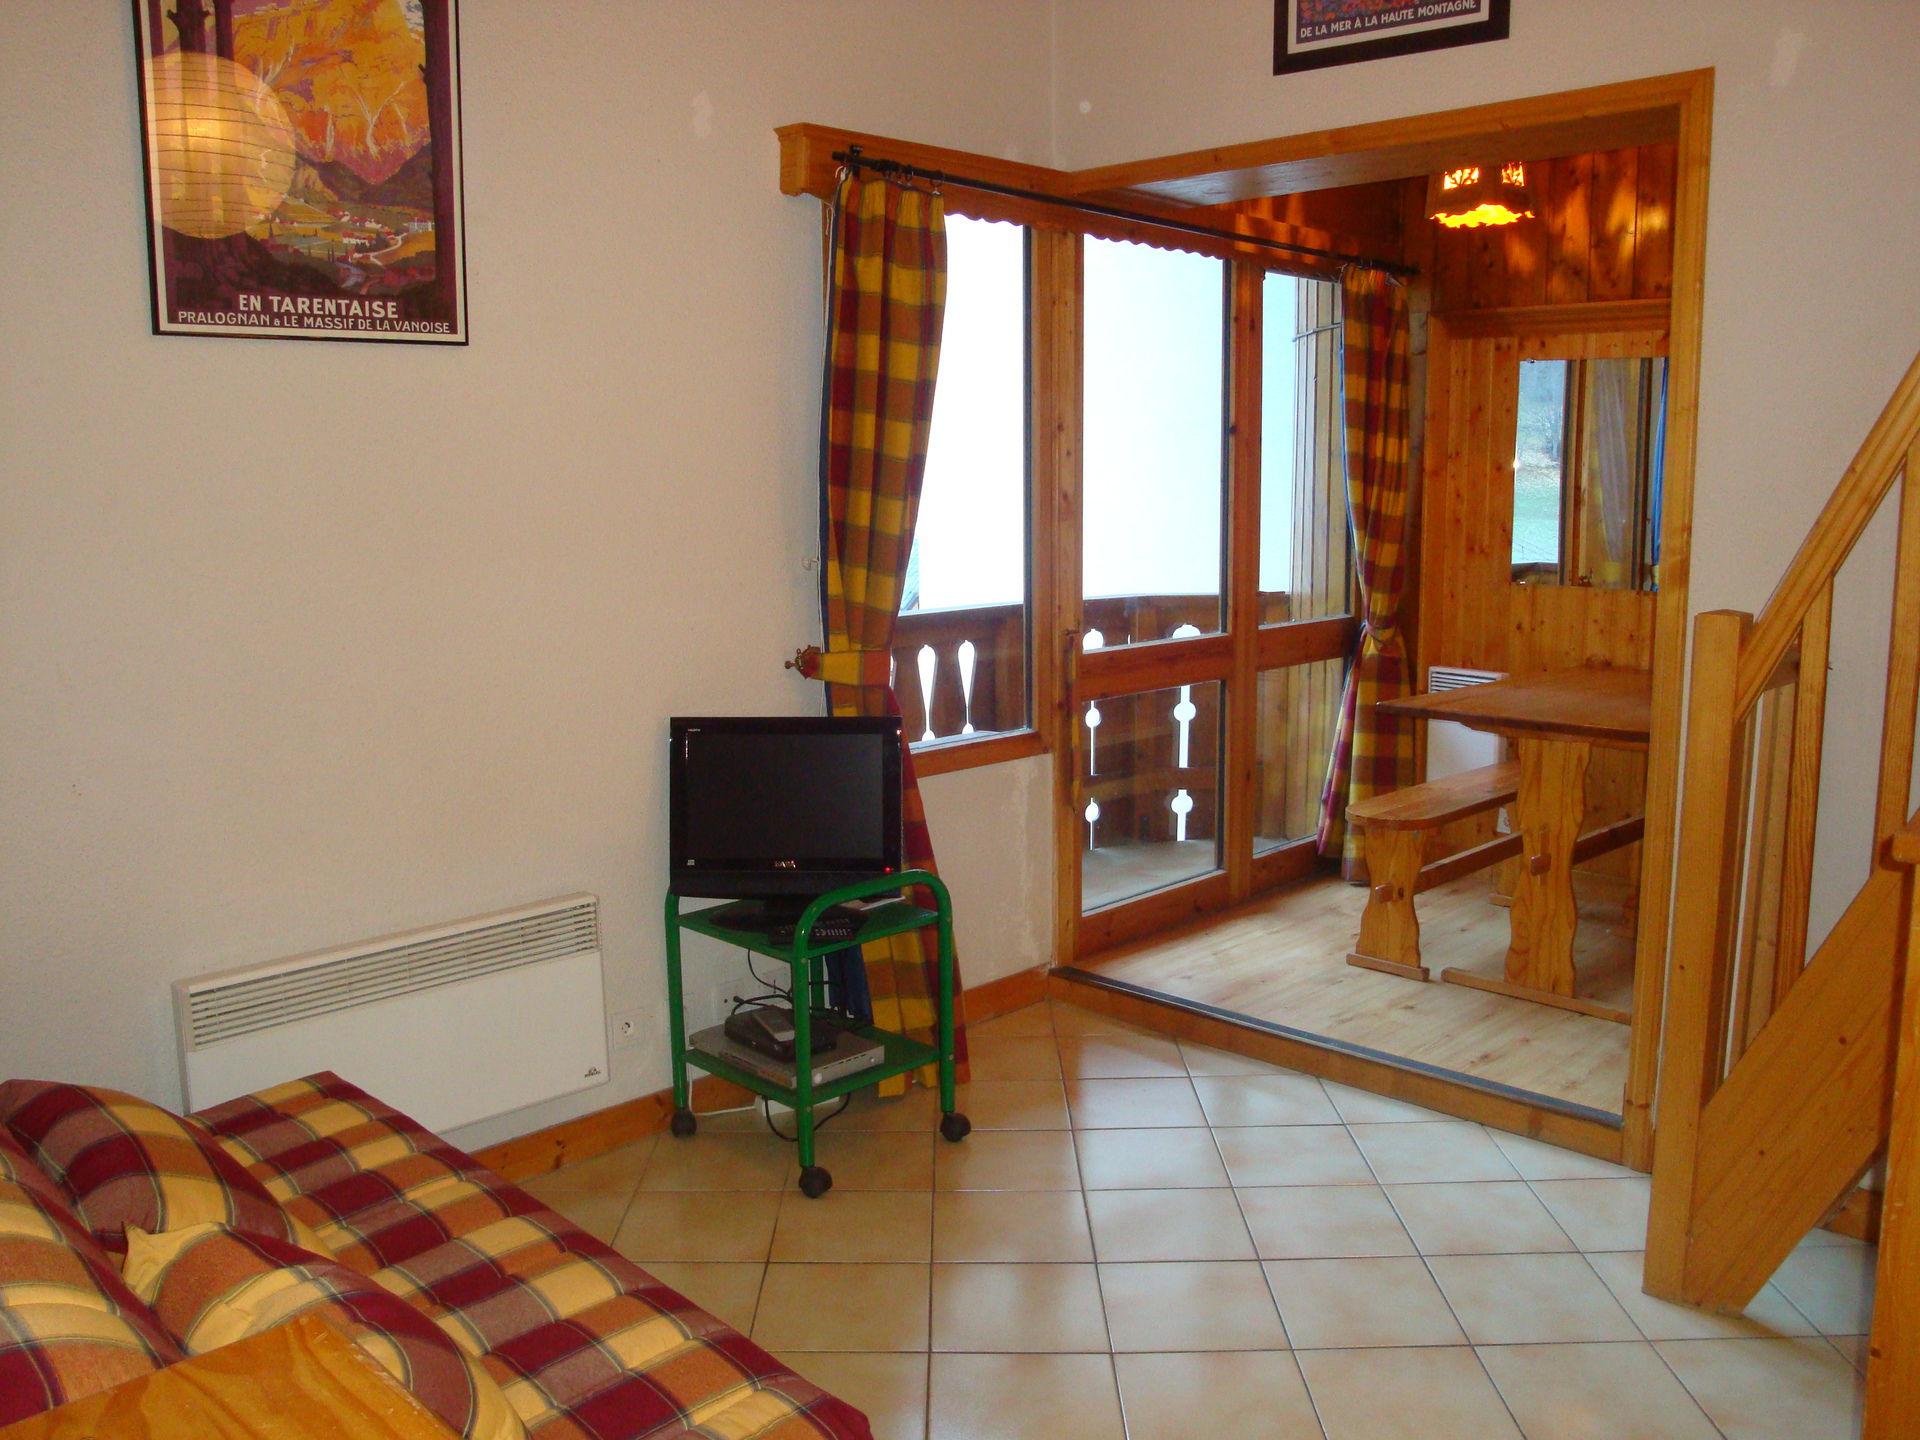 Rental reference : VANOI56 to Pralognan la Vanoise